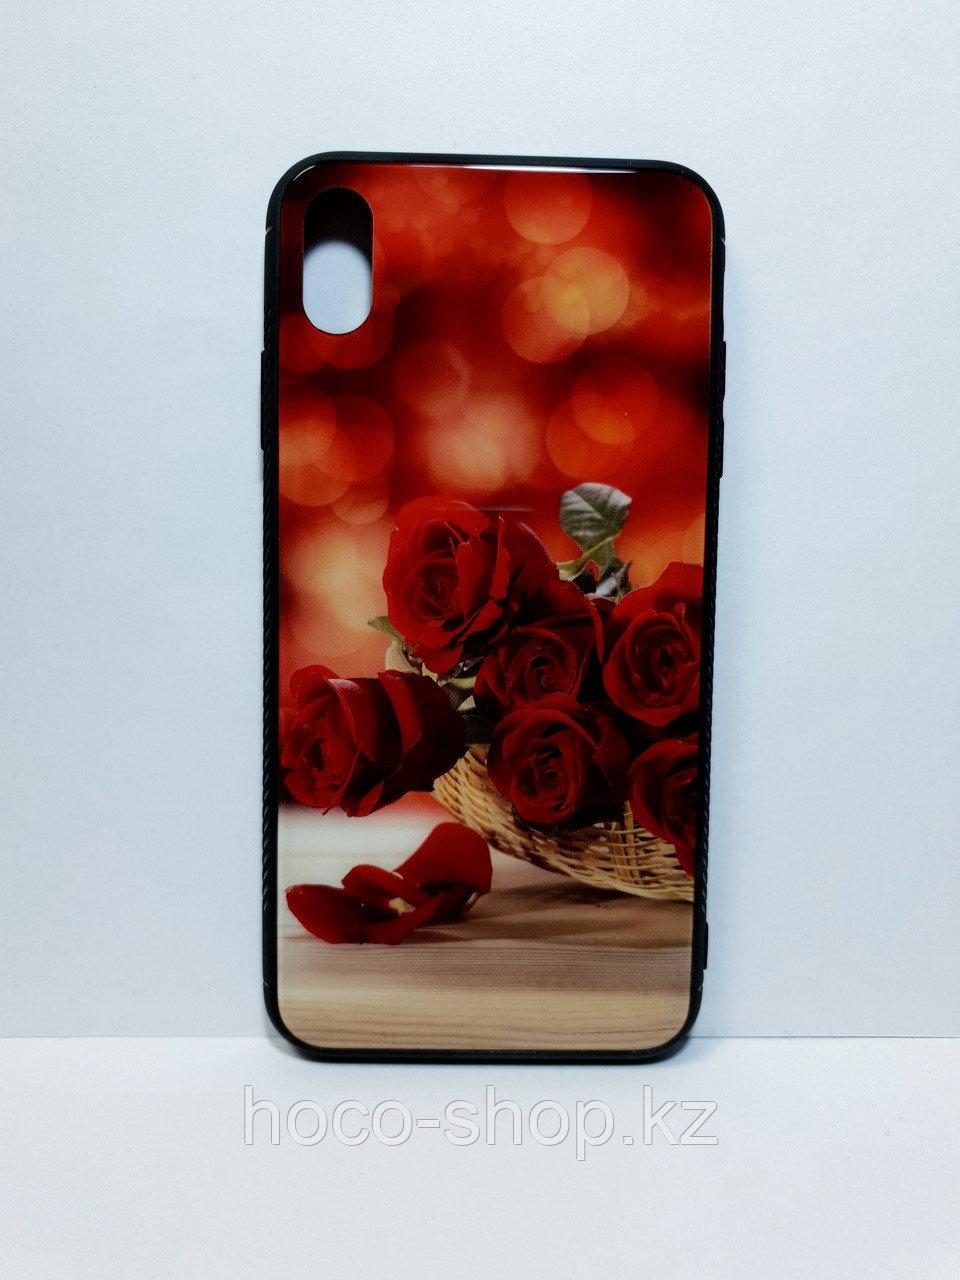 Чехол гель со стеклом iPhone Xs Max